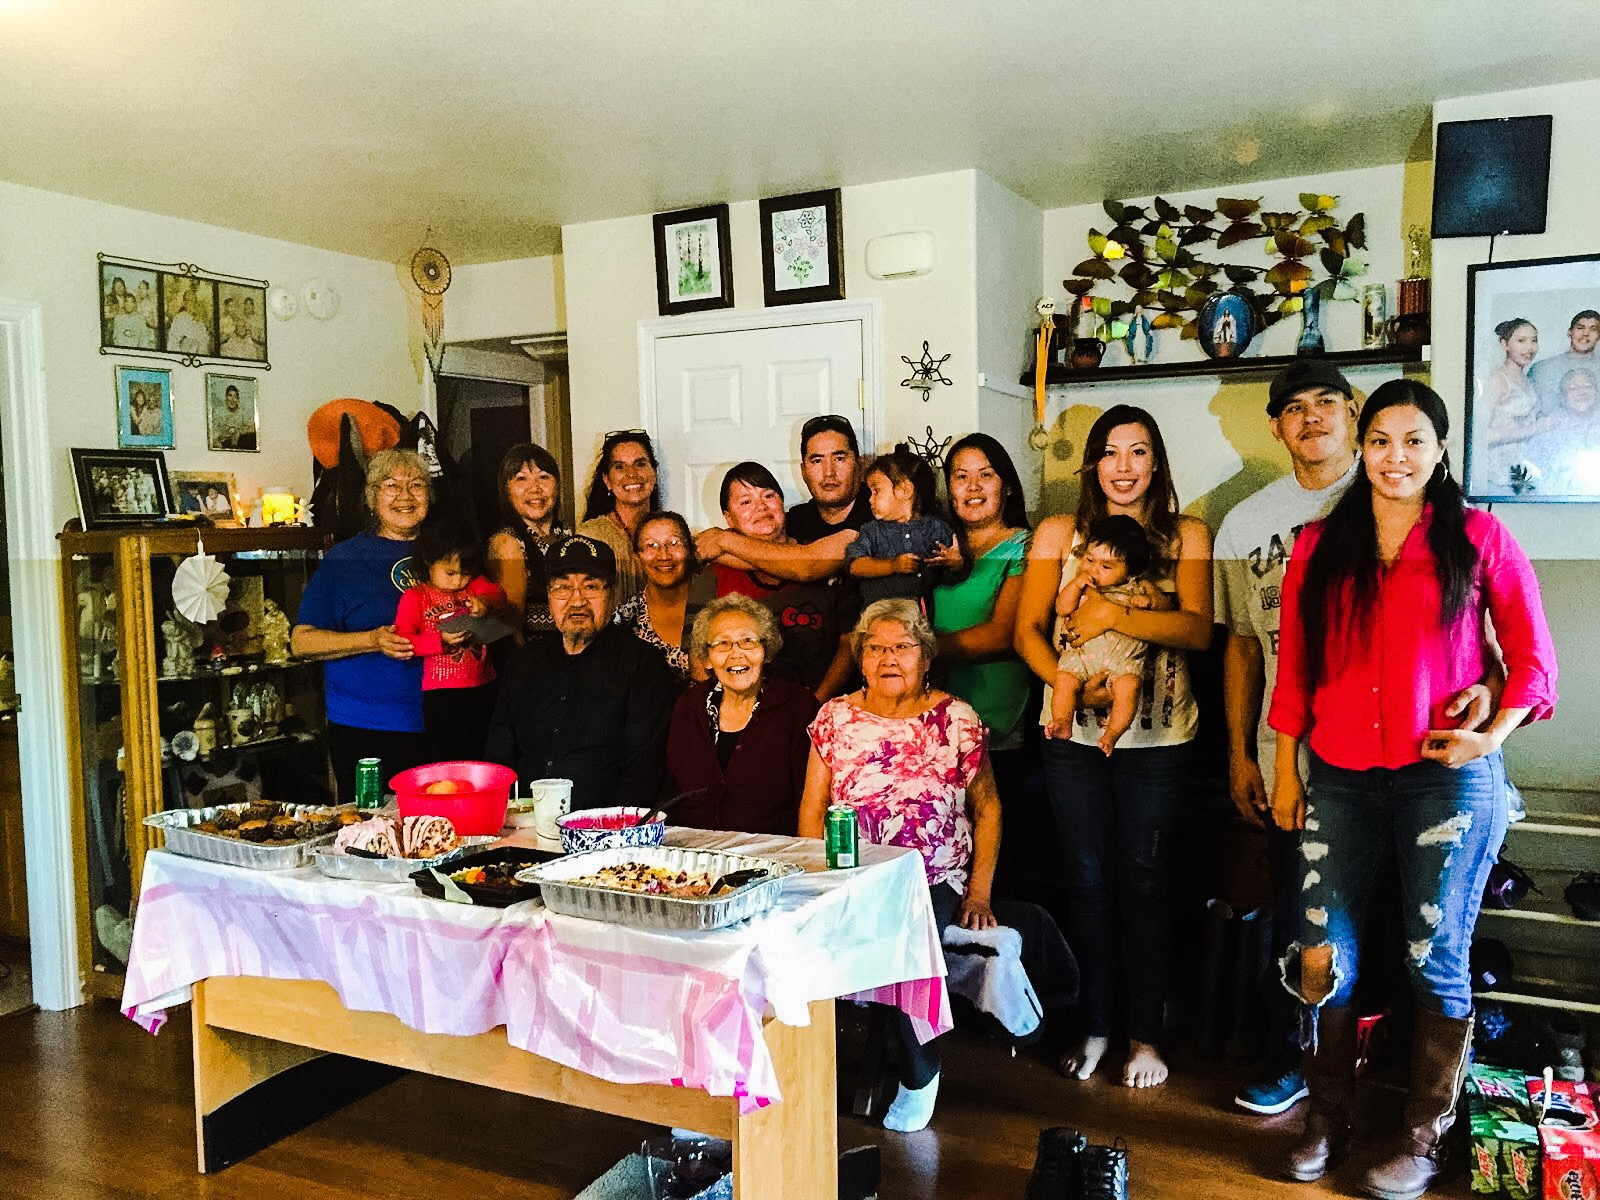 Mary St. Martin-Charles's birth family gather for dinner in Koyukuk. Courtesy photo